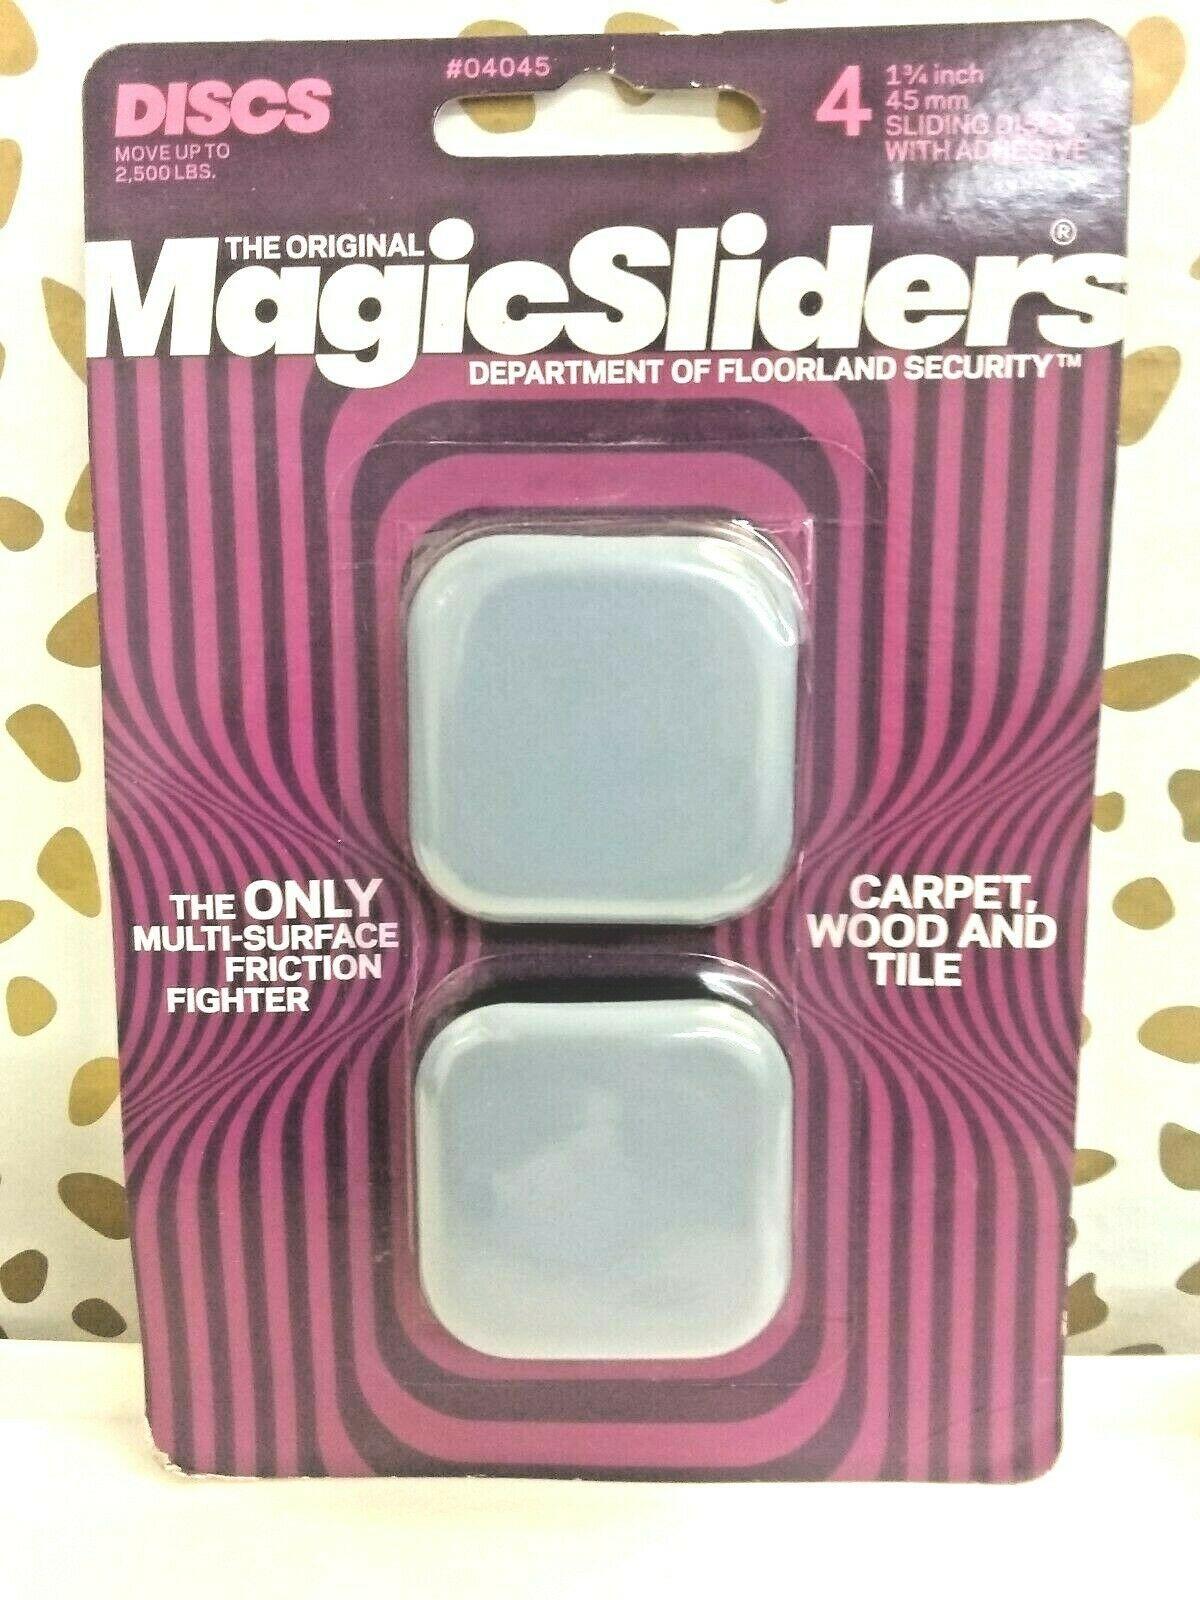 Square Magic Sliders Furniture Glide -As Seen On TV #4045,Magic Sliders-SEALED